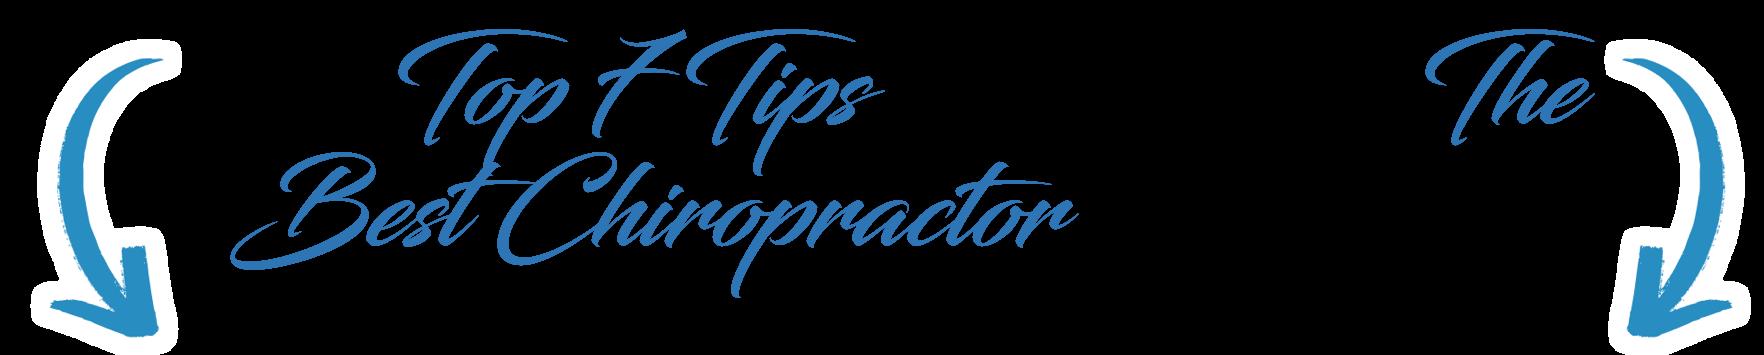 chiropractor in centennial how to find the best chiropractor